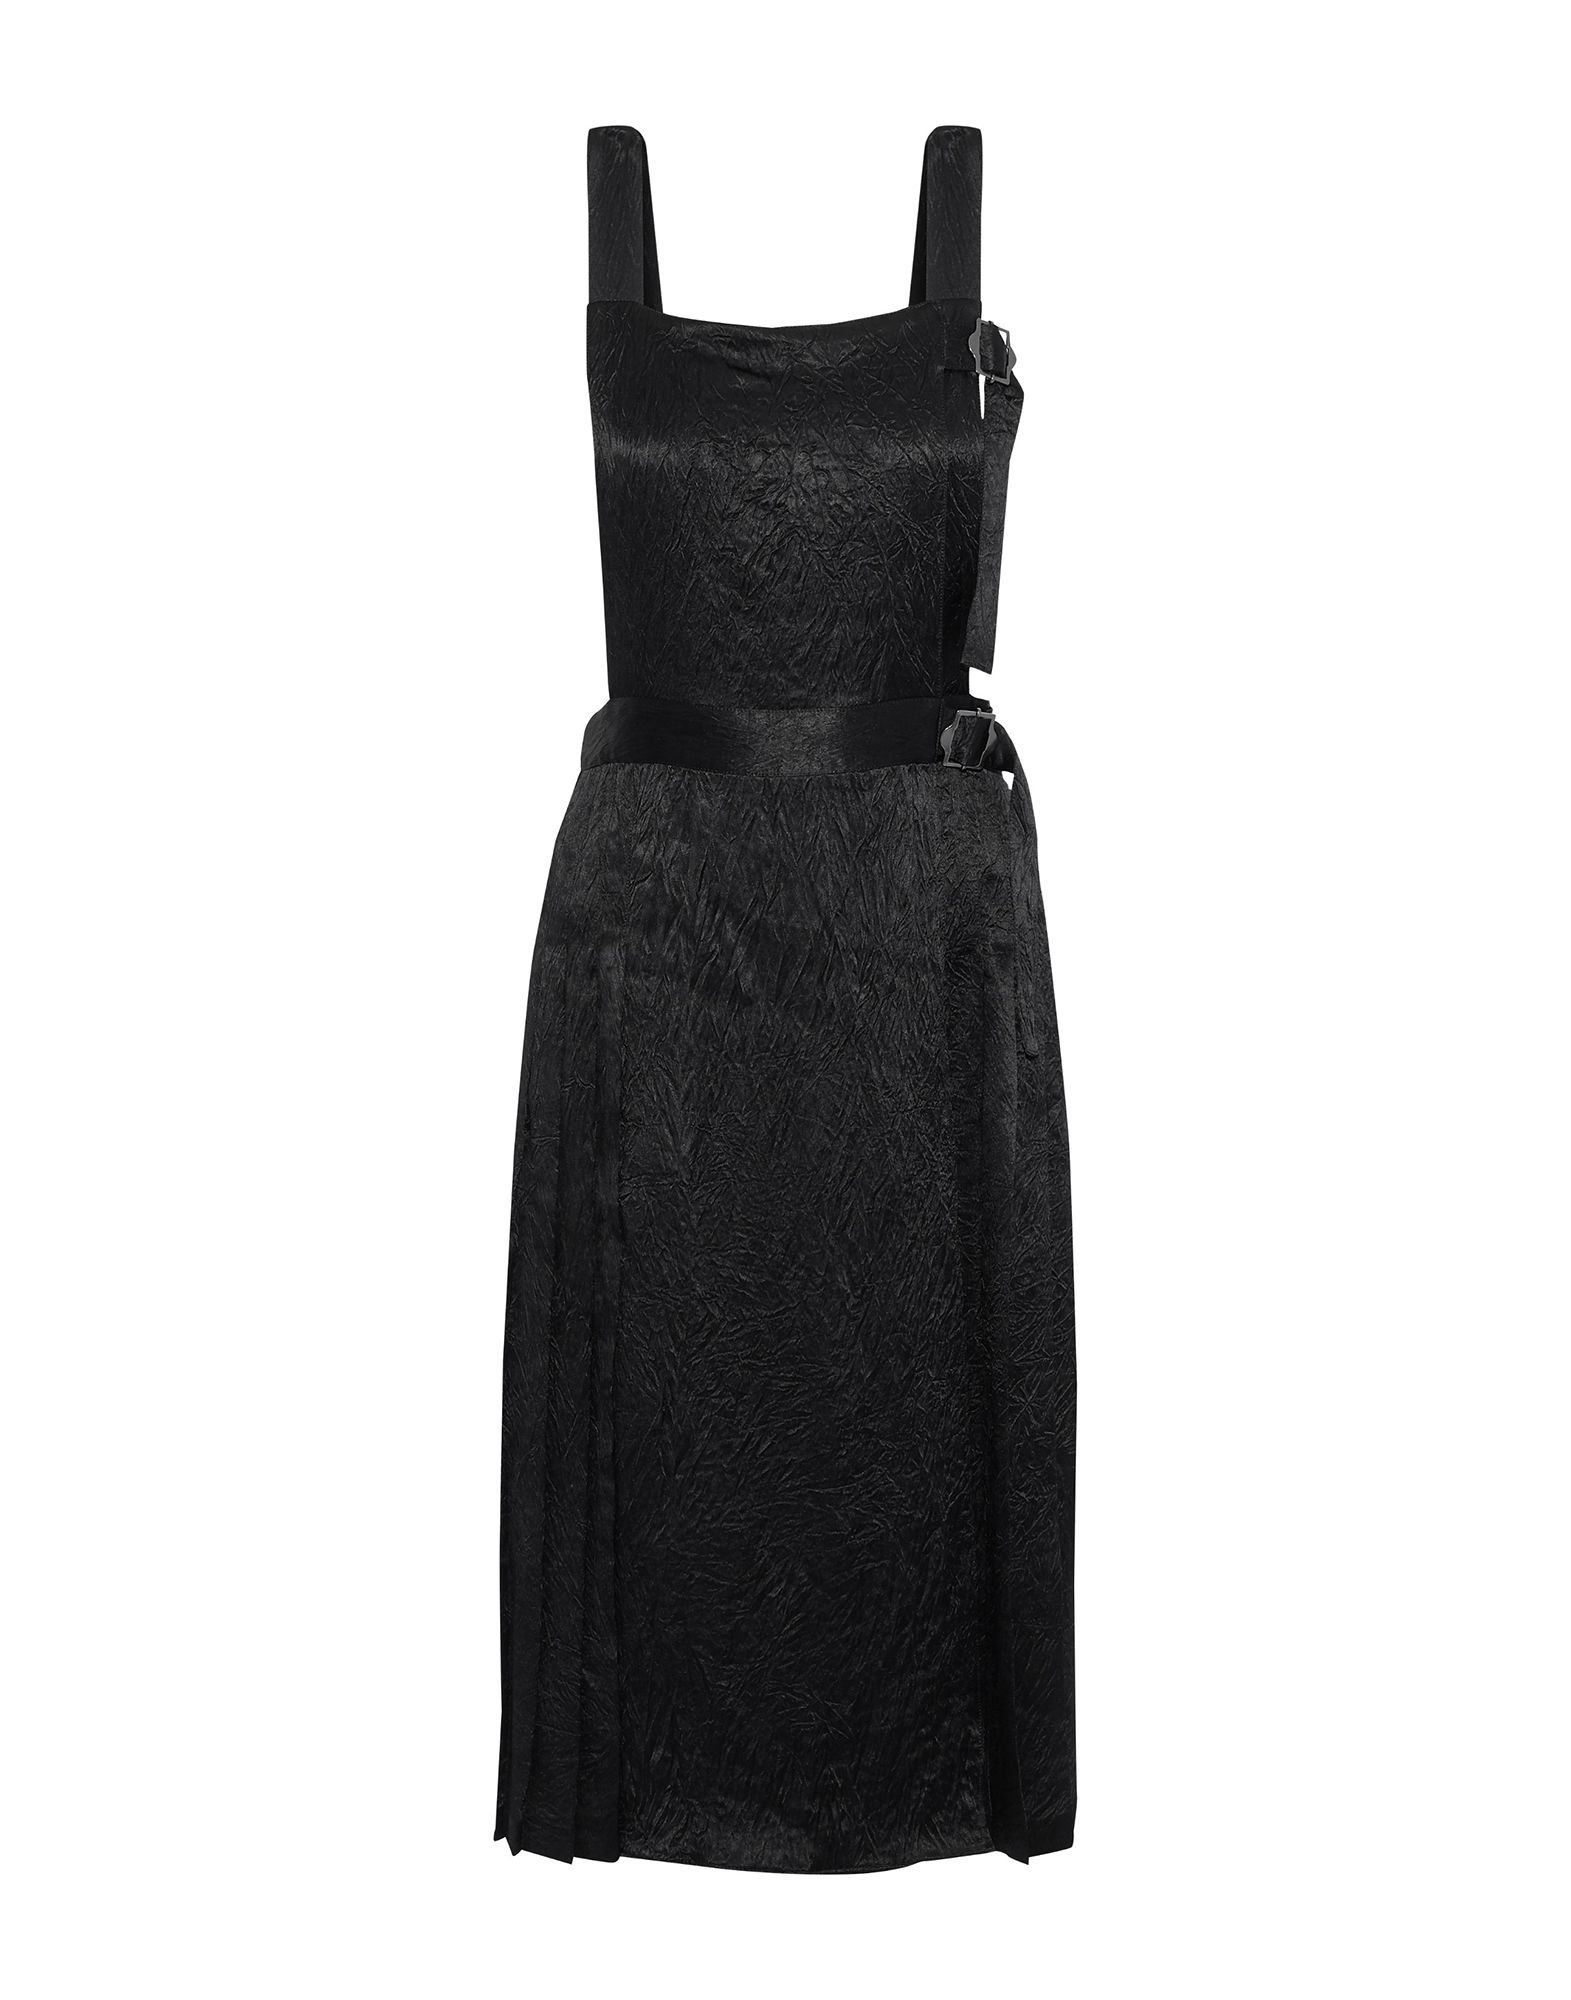 OPENING CEREMONY Платье длиной 3/4